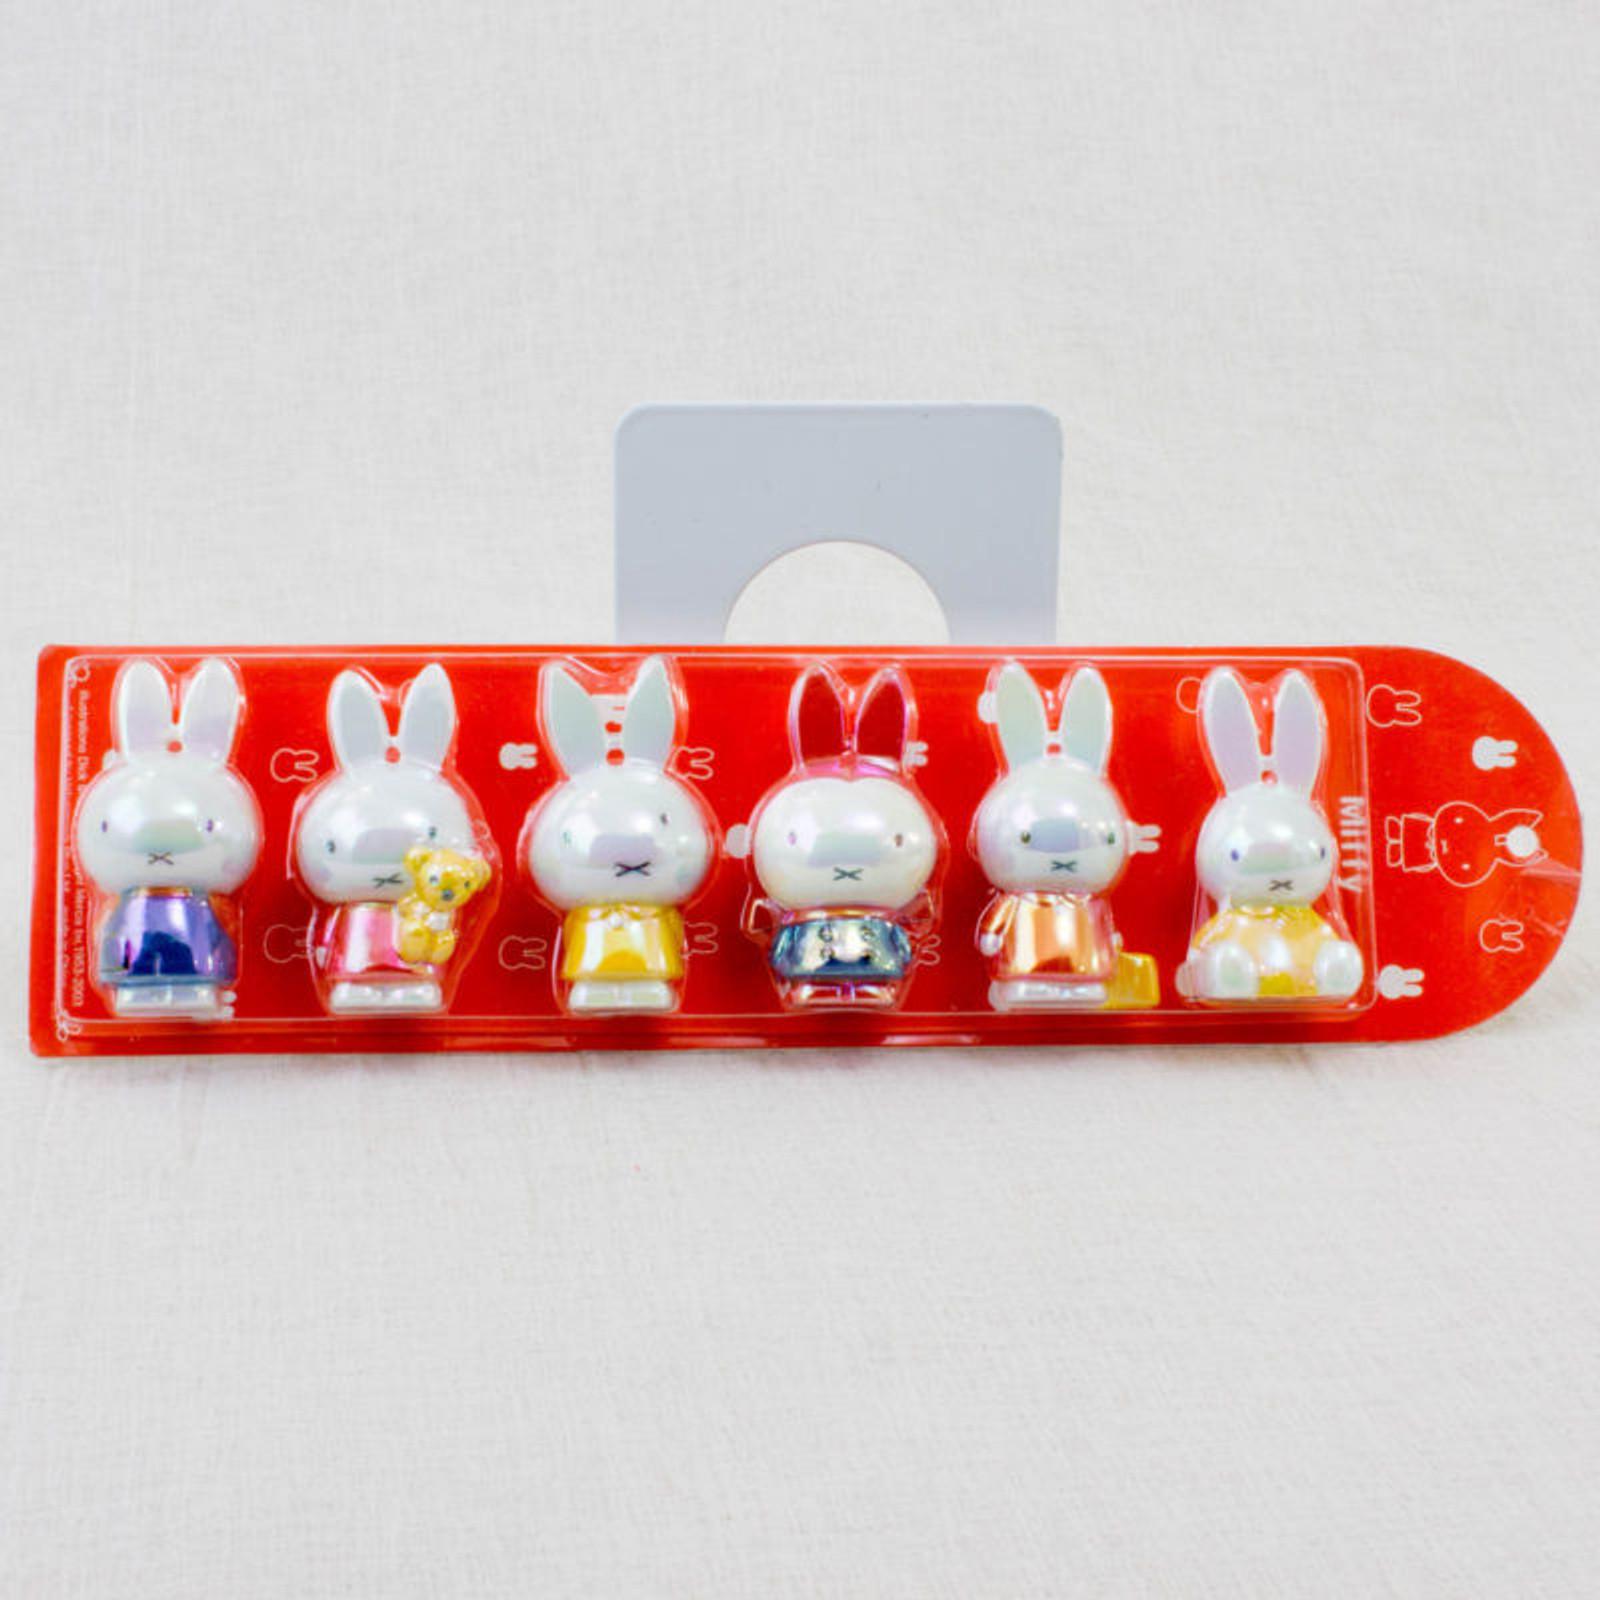 Miffy Mini Figure 6pc Set Dick Bruna JAPAN RABBIT